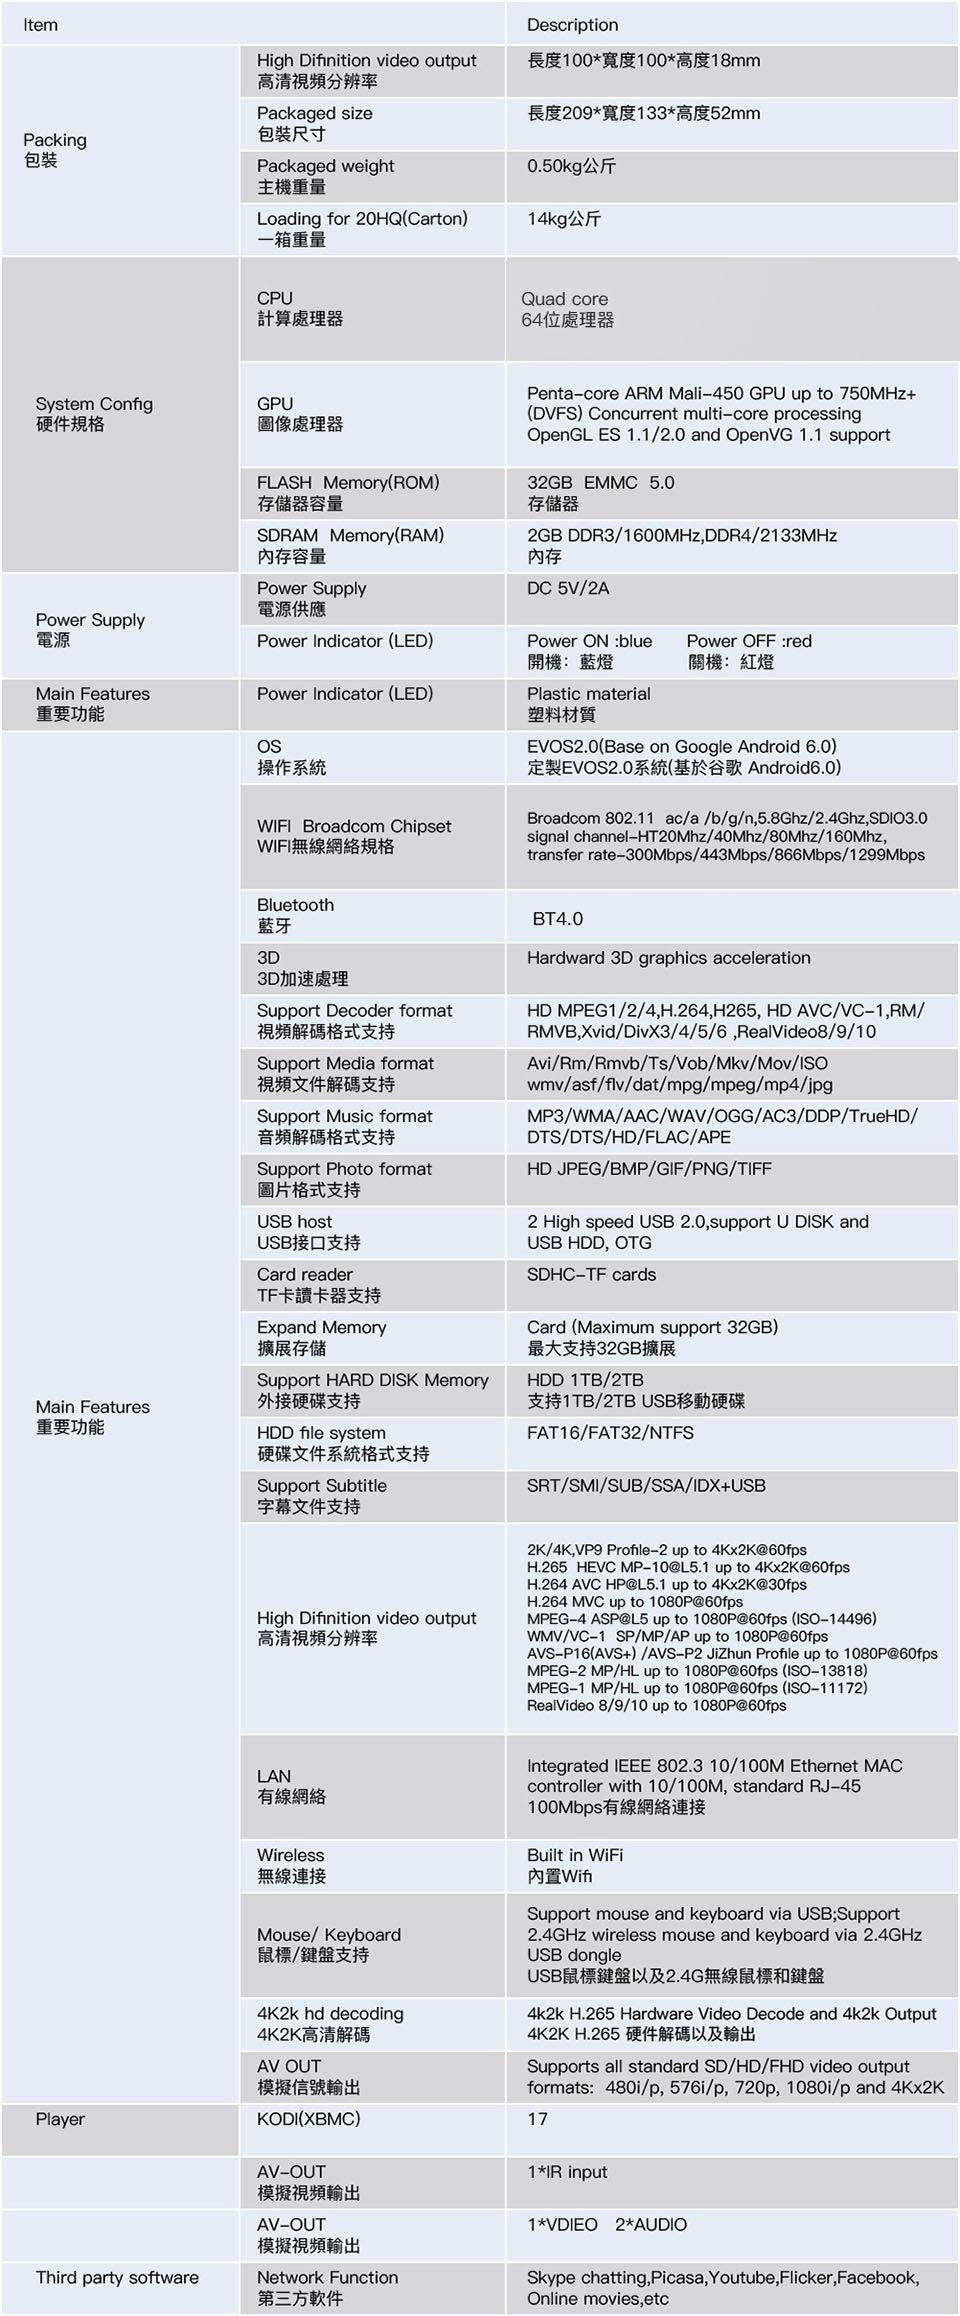 Amambox 2018 EVPAD Plus Android 6.0 Korean Hong Kong China Live IPTV Box & Korea Drama한국 라이브 TV 채널&한국 드라마